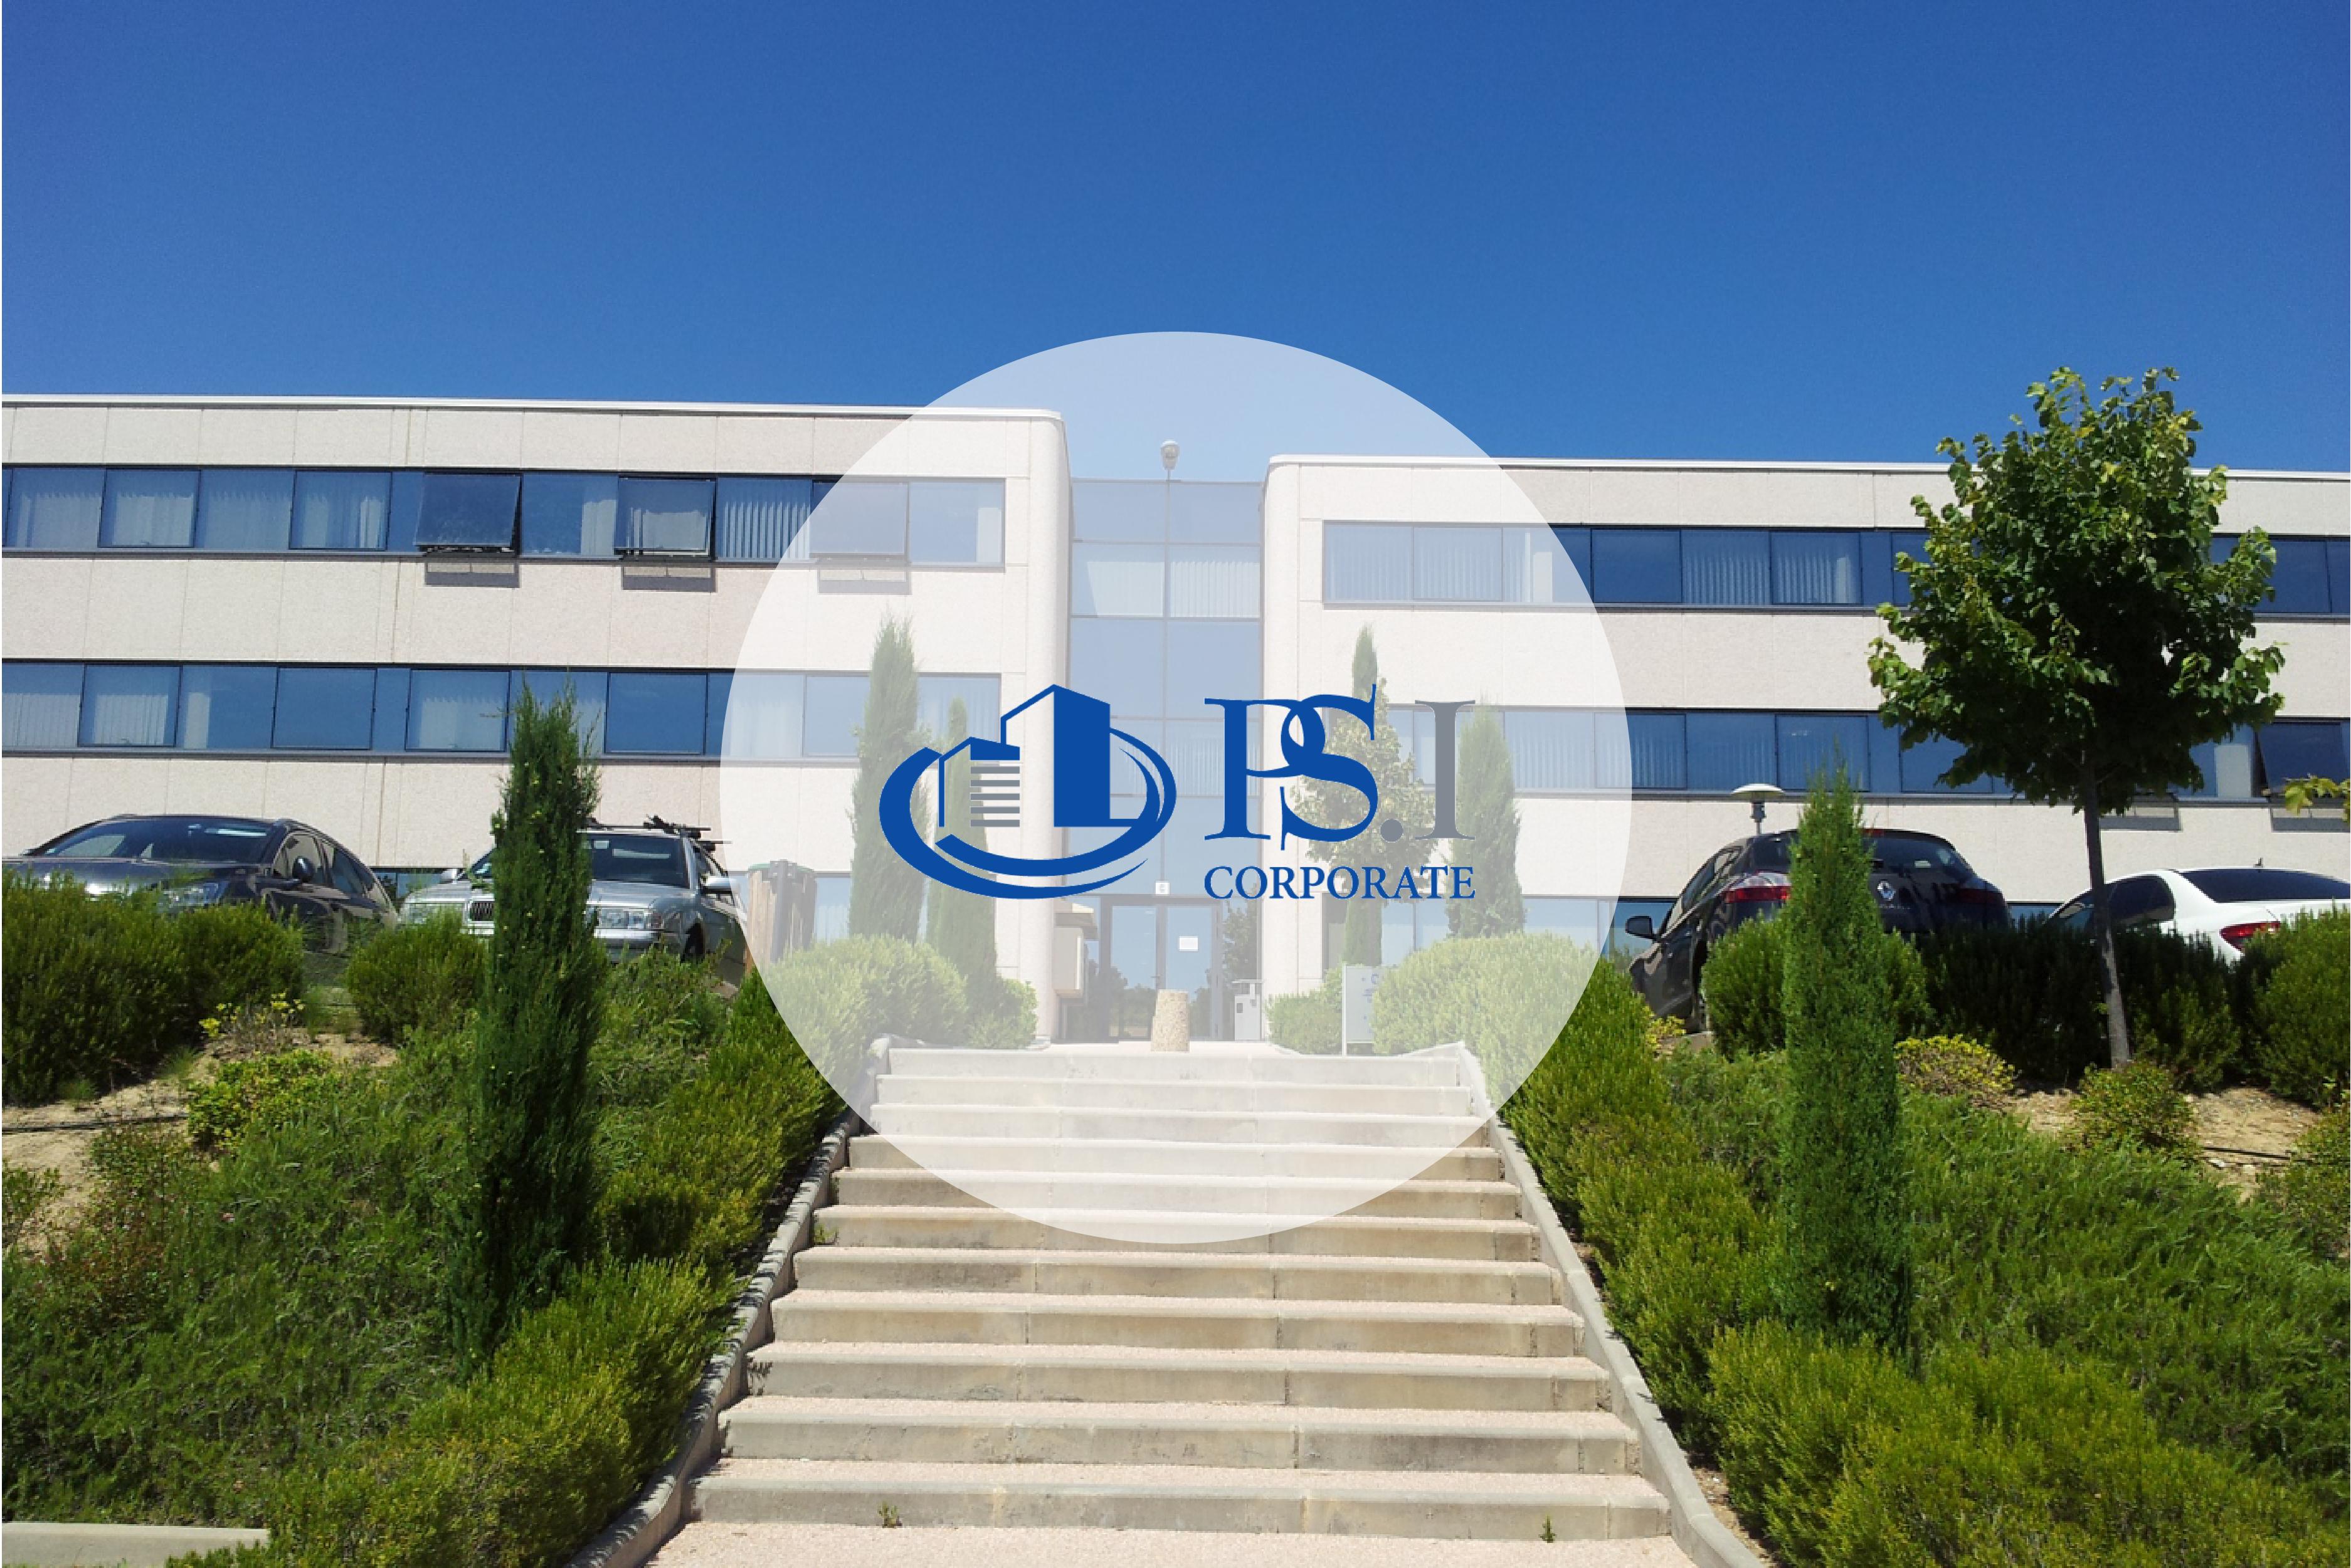 PSI Corporate